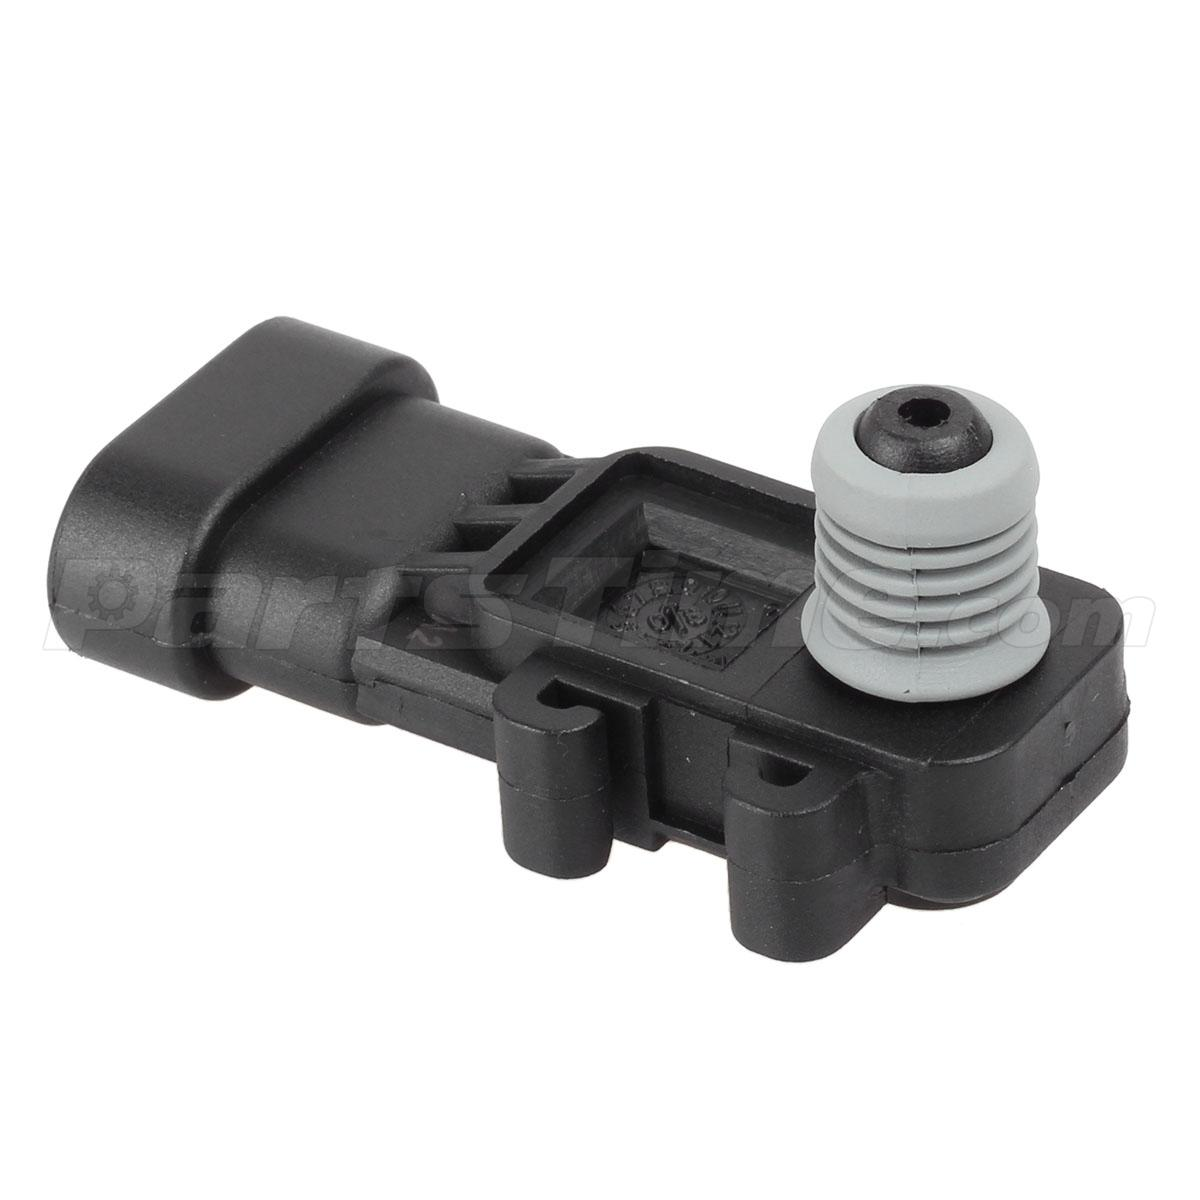 16238399 Fuel Tank Pressure Sensor For GMC C/K 1500 2500